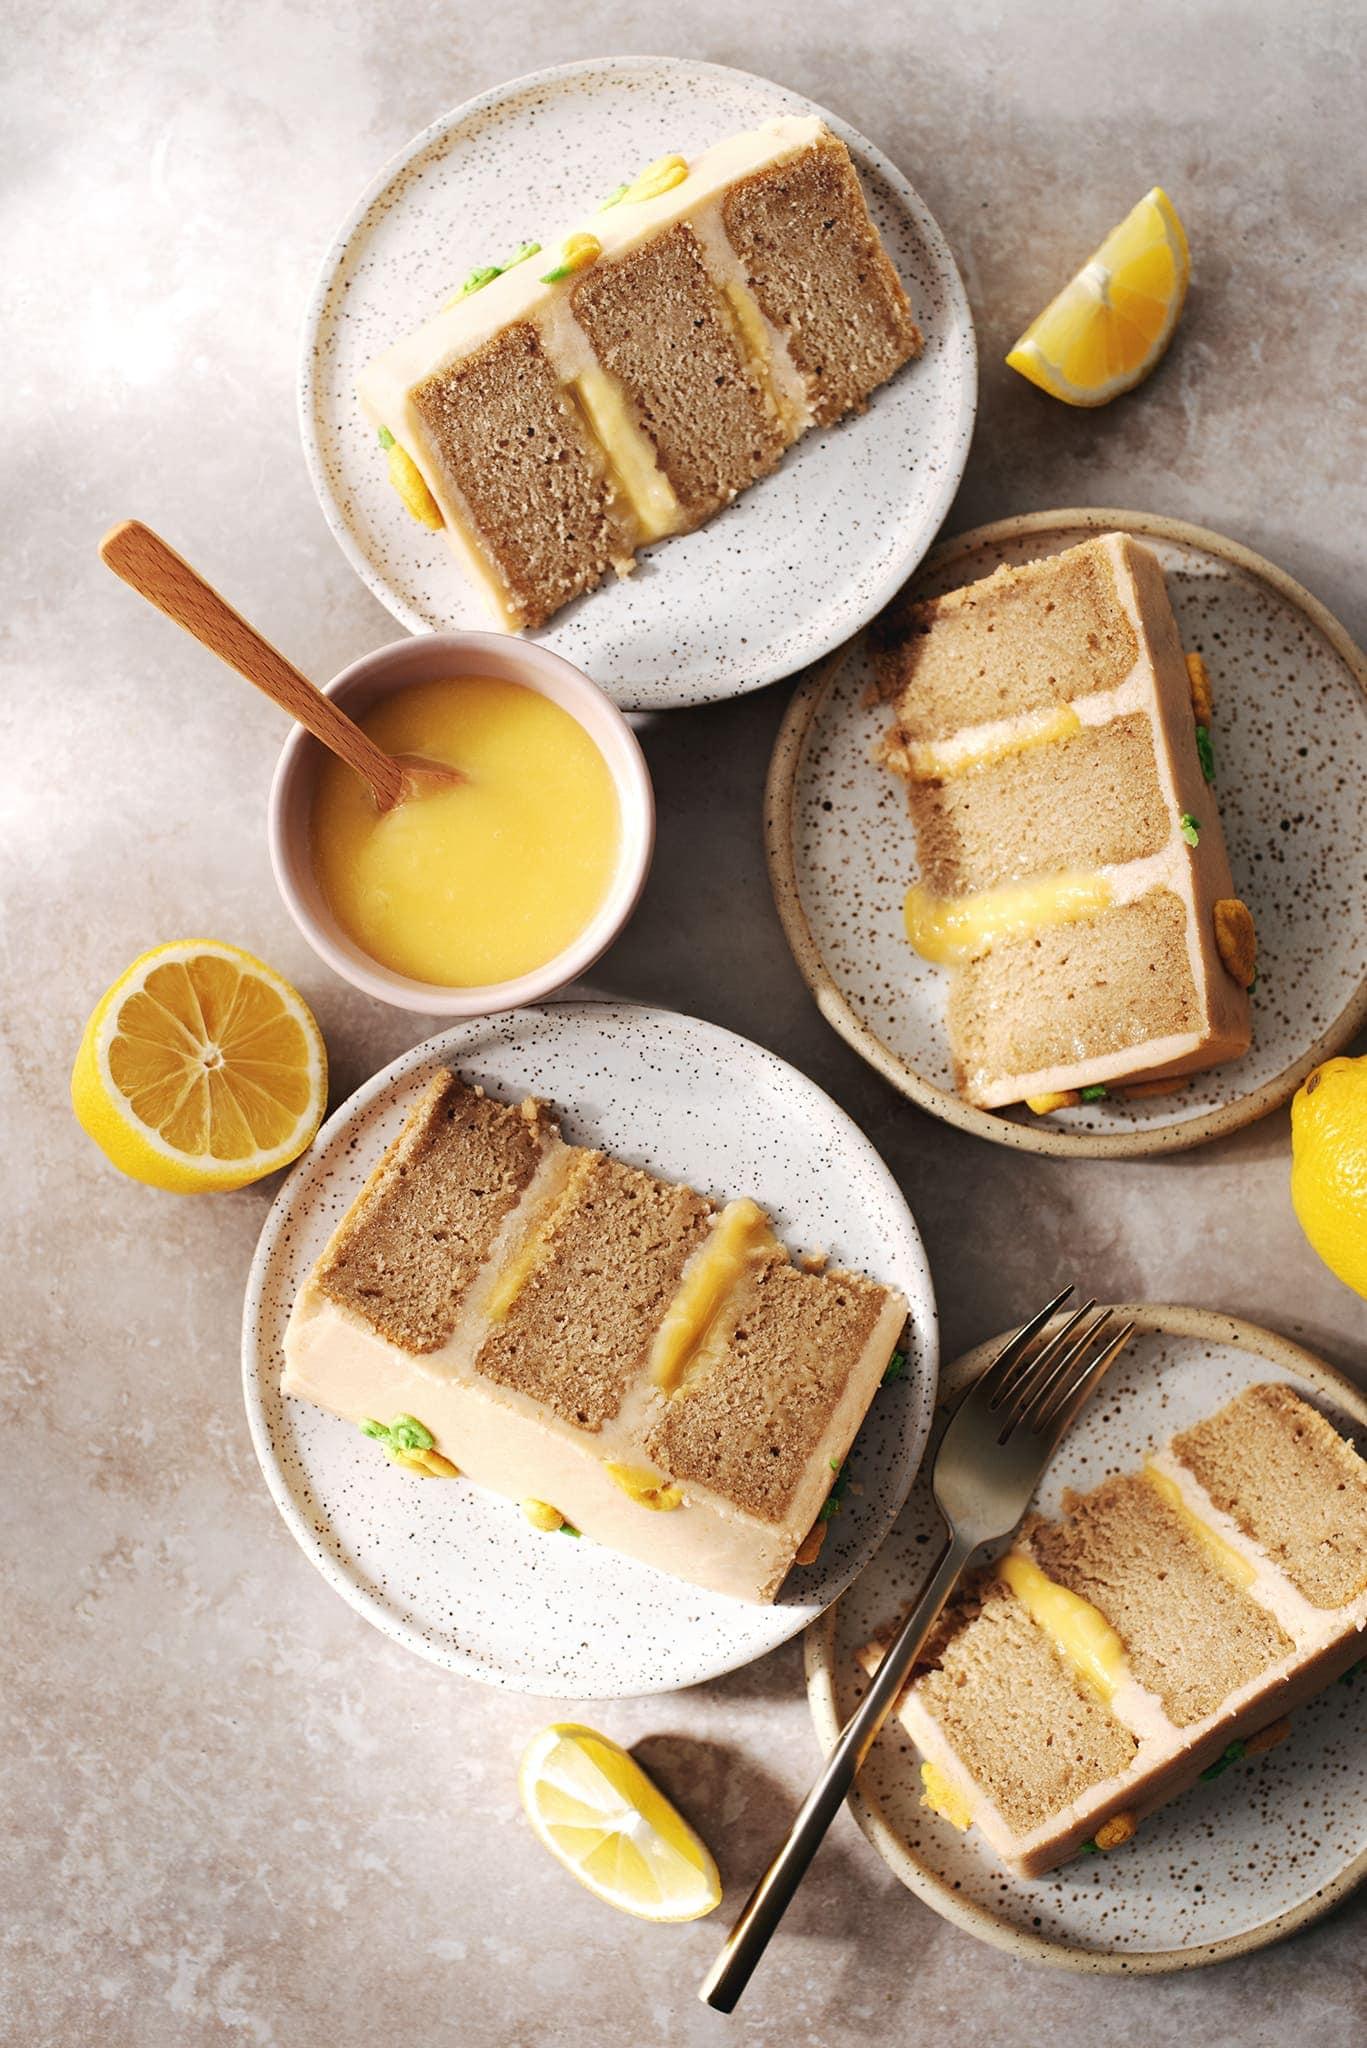 Slices of earl grey lemon cake on plates